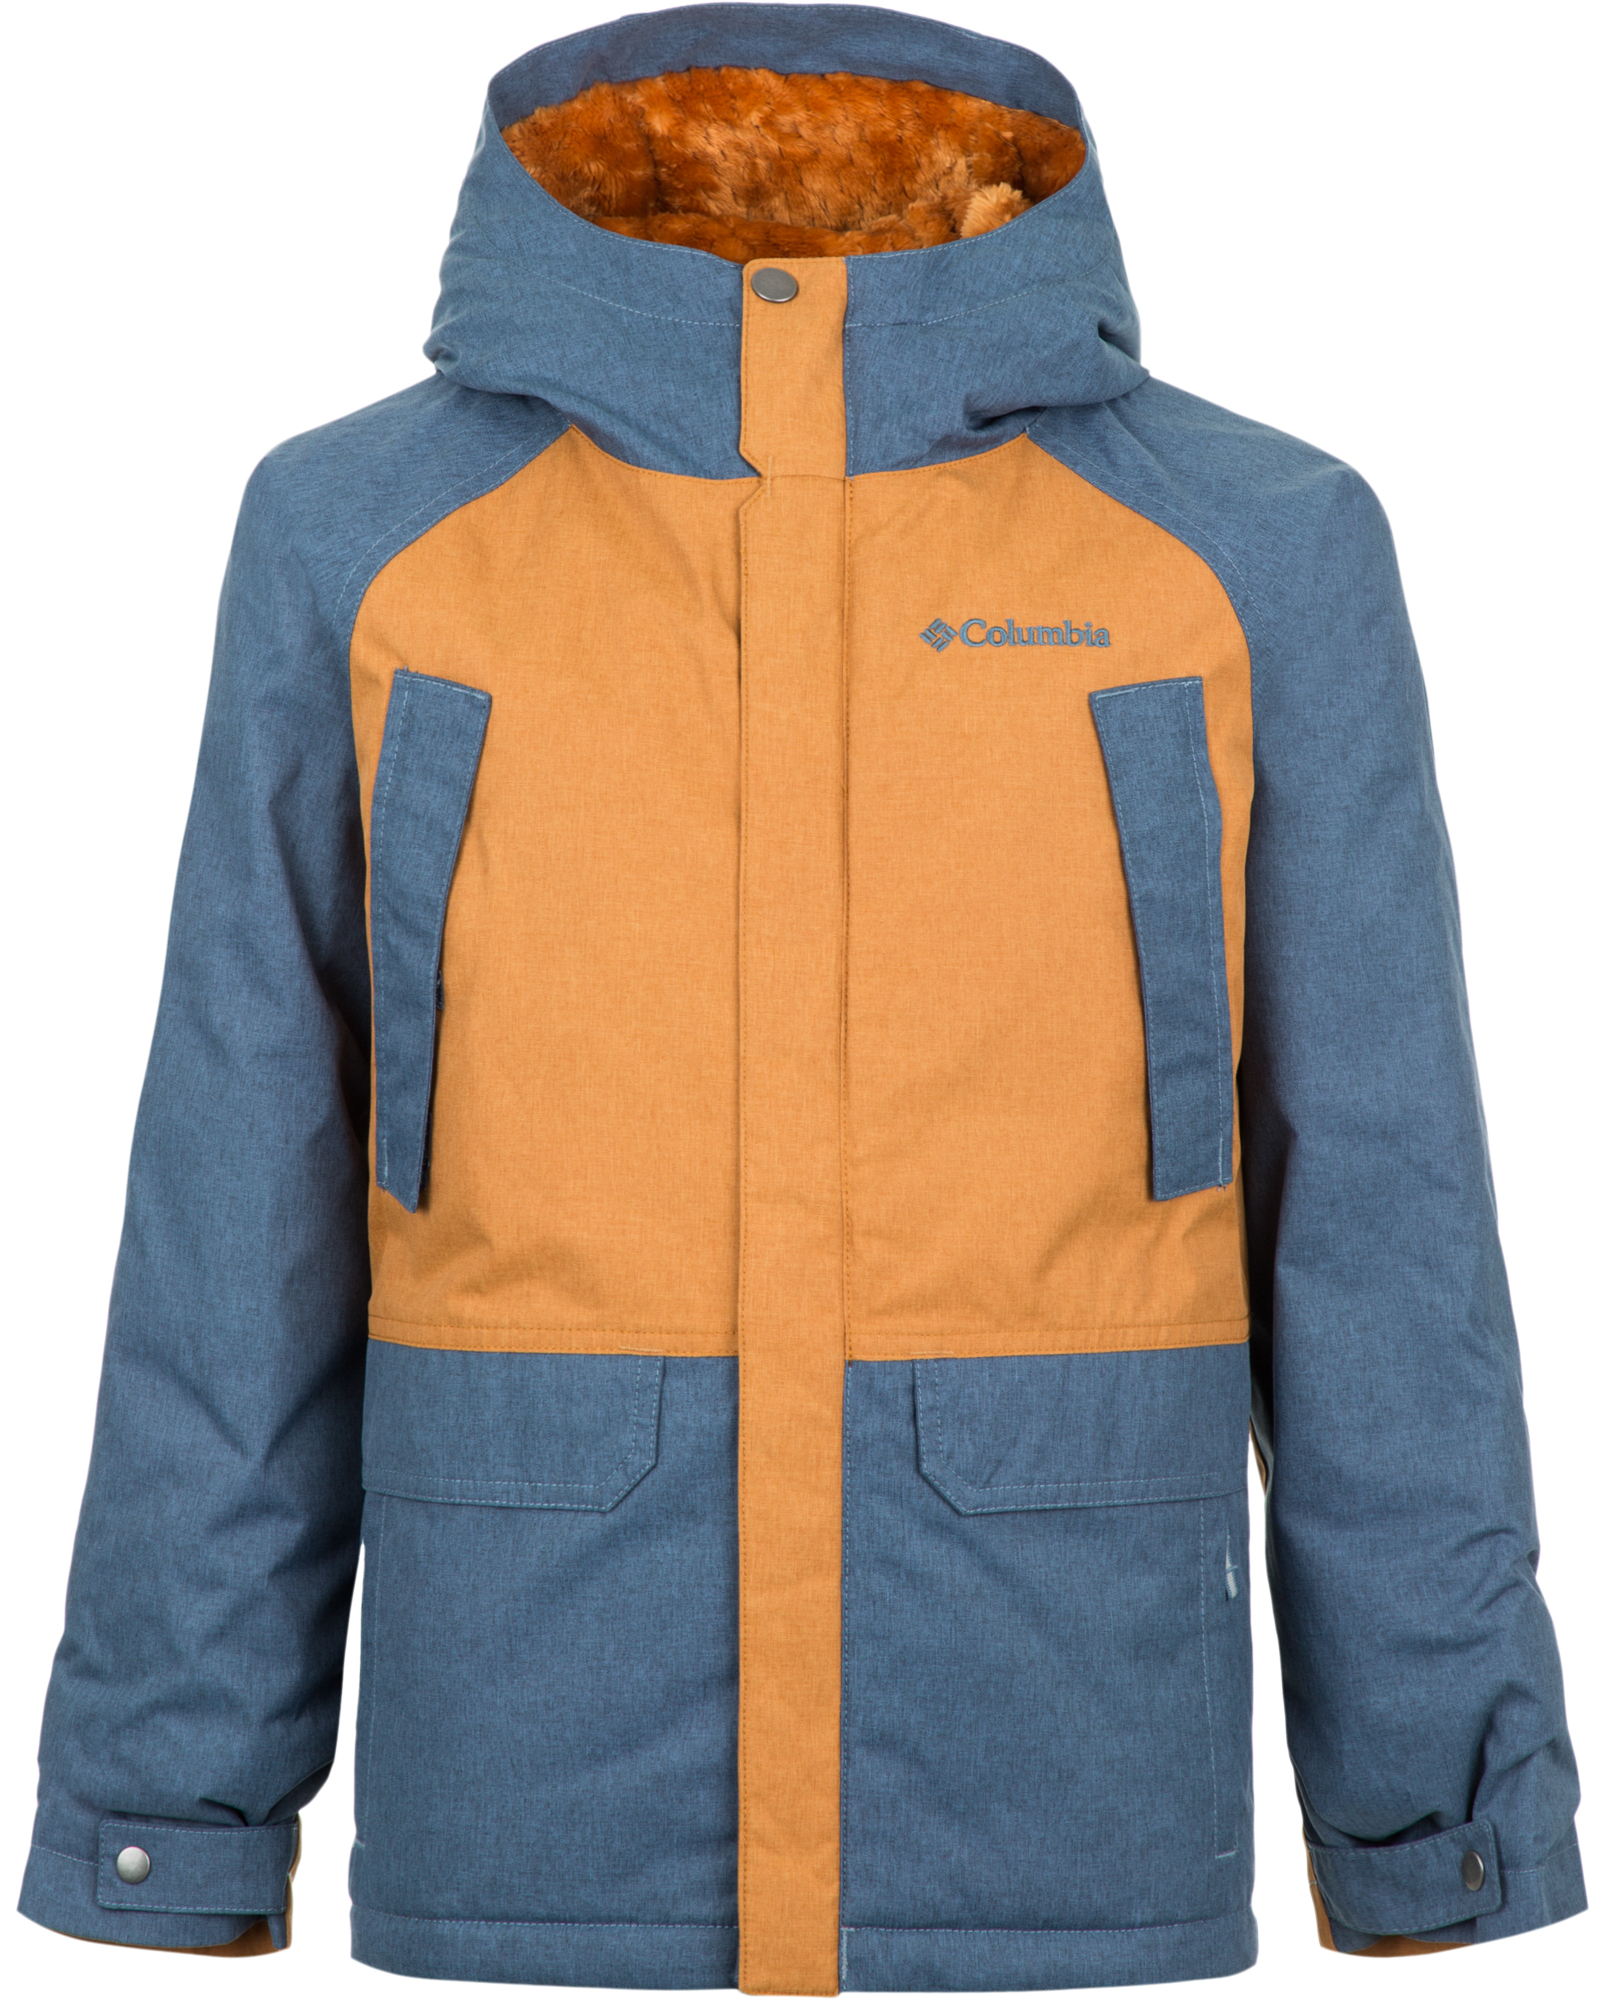 Columbia Куртка утепленная для мальчиков Timberlake Lodge, размер 160-170